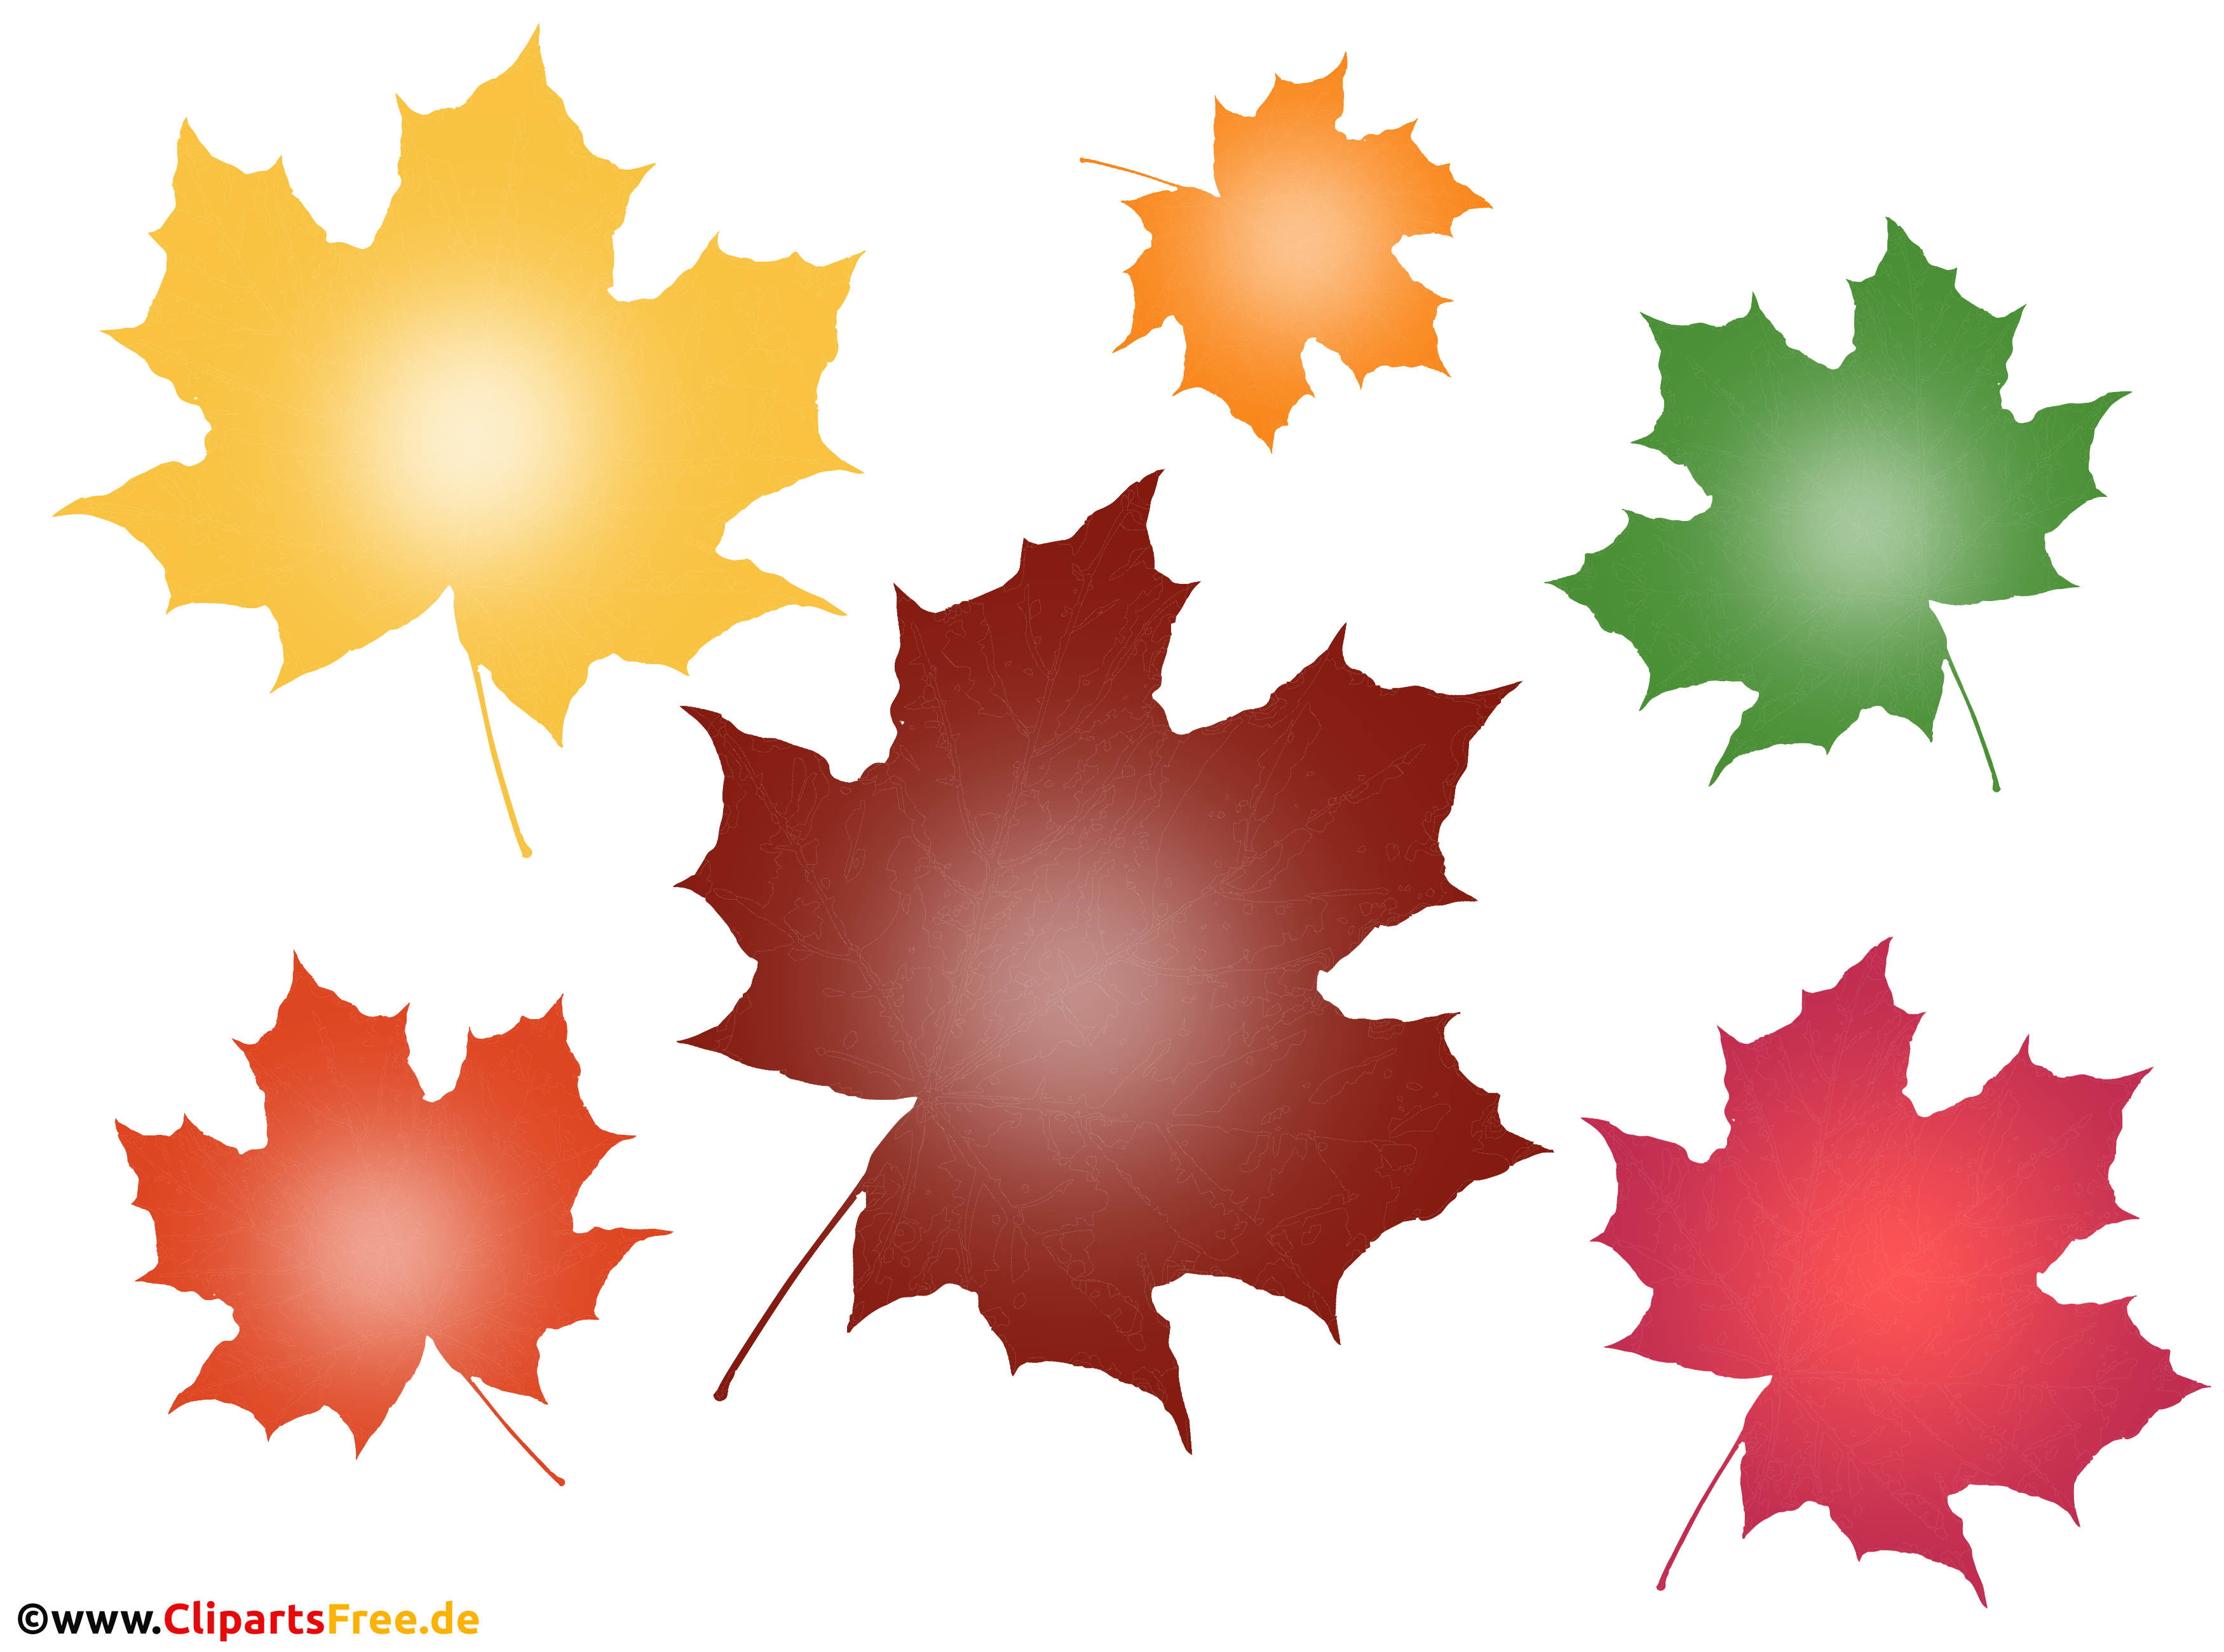 Bunte Baumblätter im Herbst Clipart, Bild, Illustration